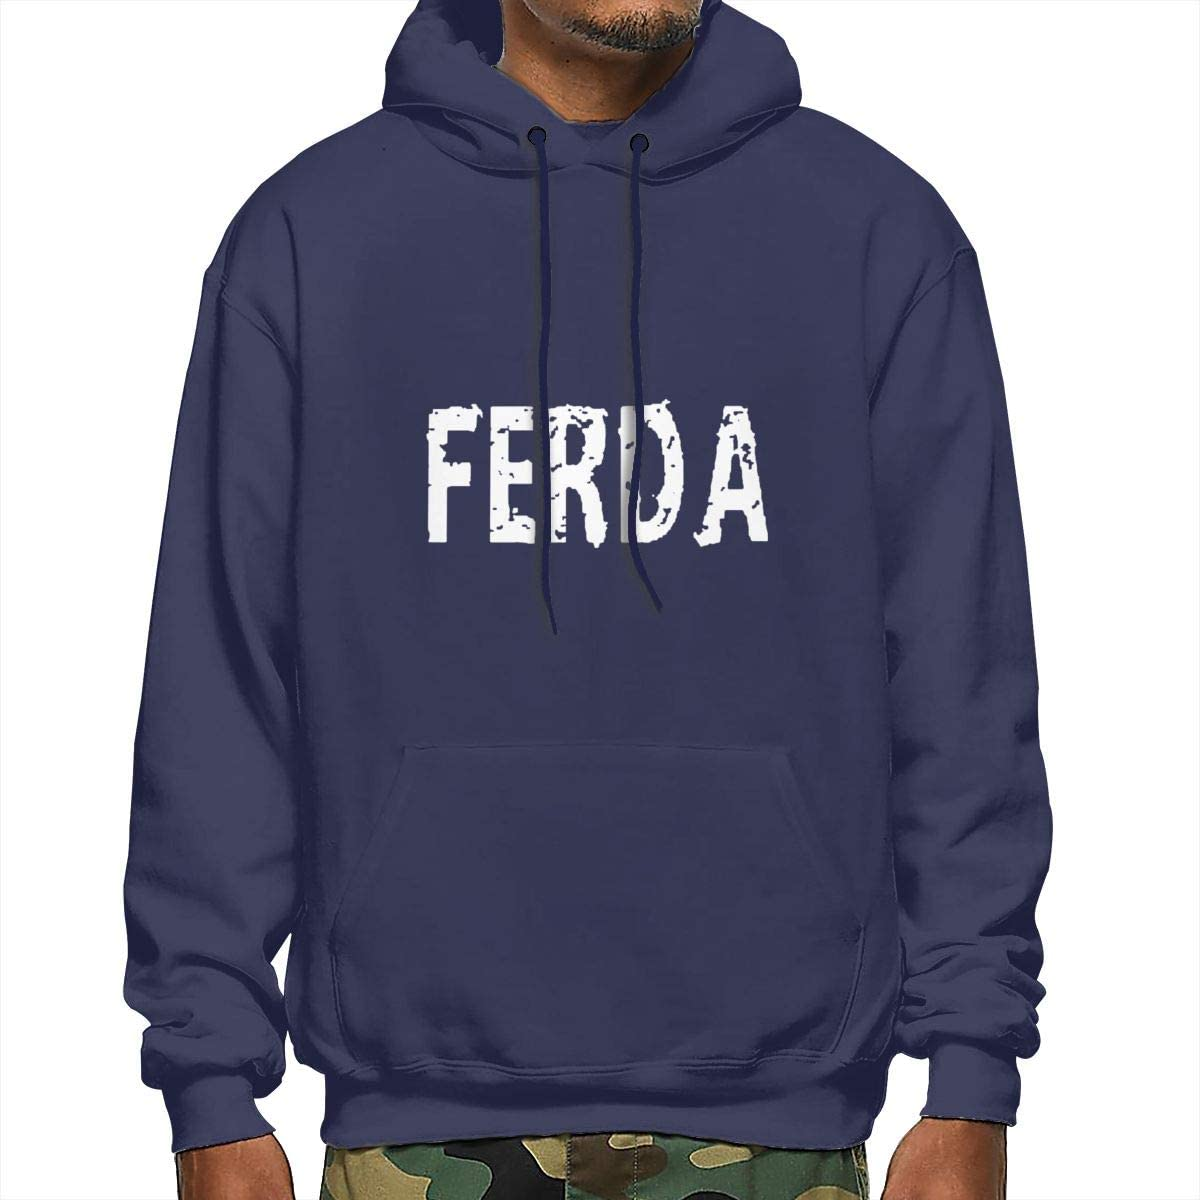 Mens Autumn Winter Long Sleeve Hoodies Ferda Letterkenny Logo Hooded Pockets Sweatshirt Tracksuits Black